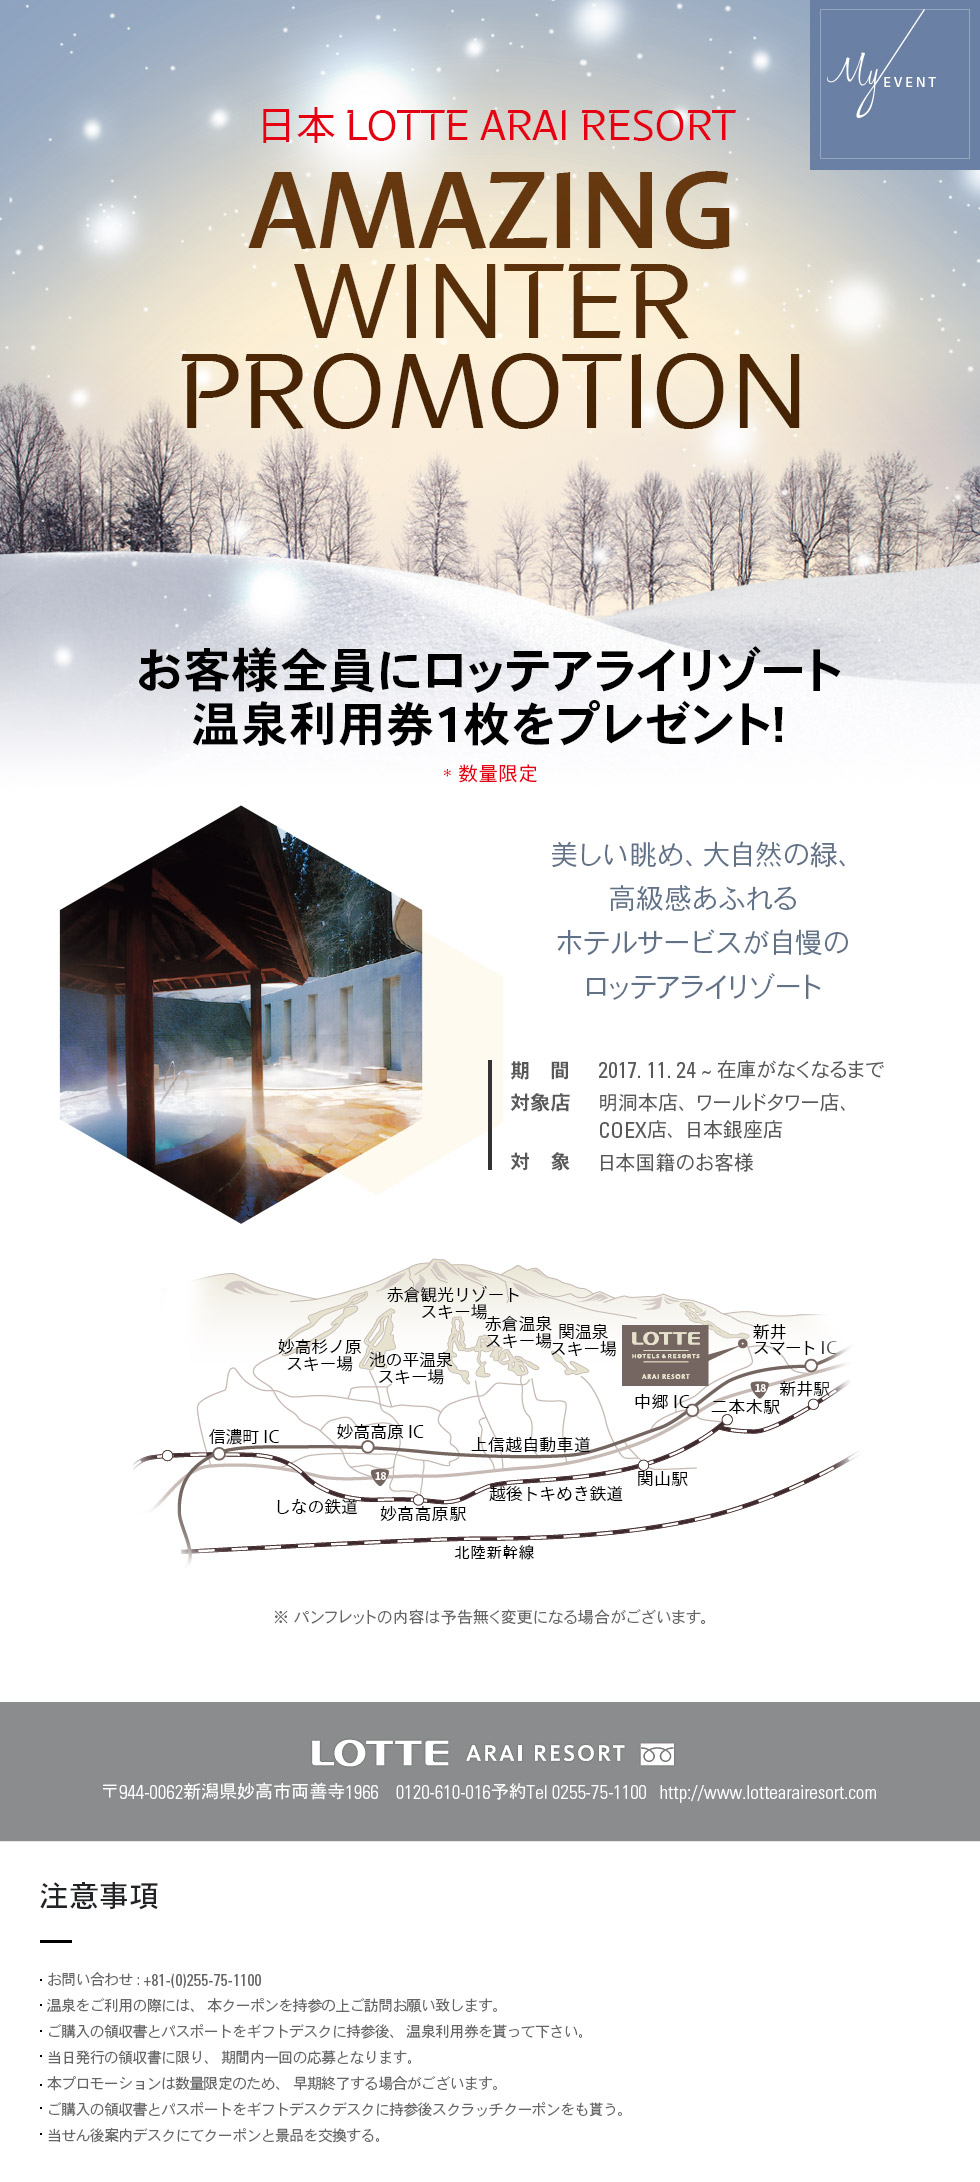 AMAZING WINTER PROMOTION_이벤트1 삭제